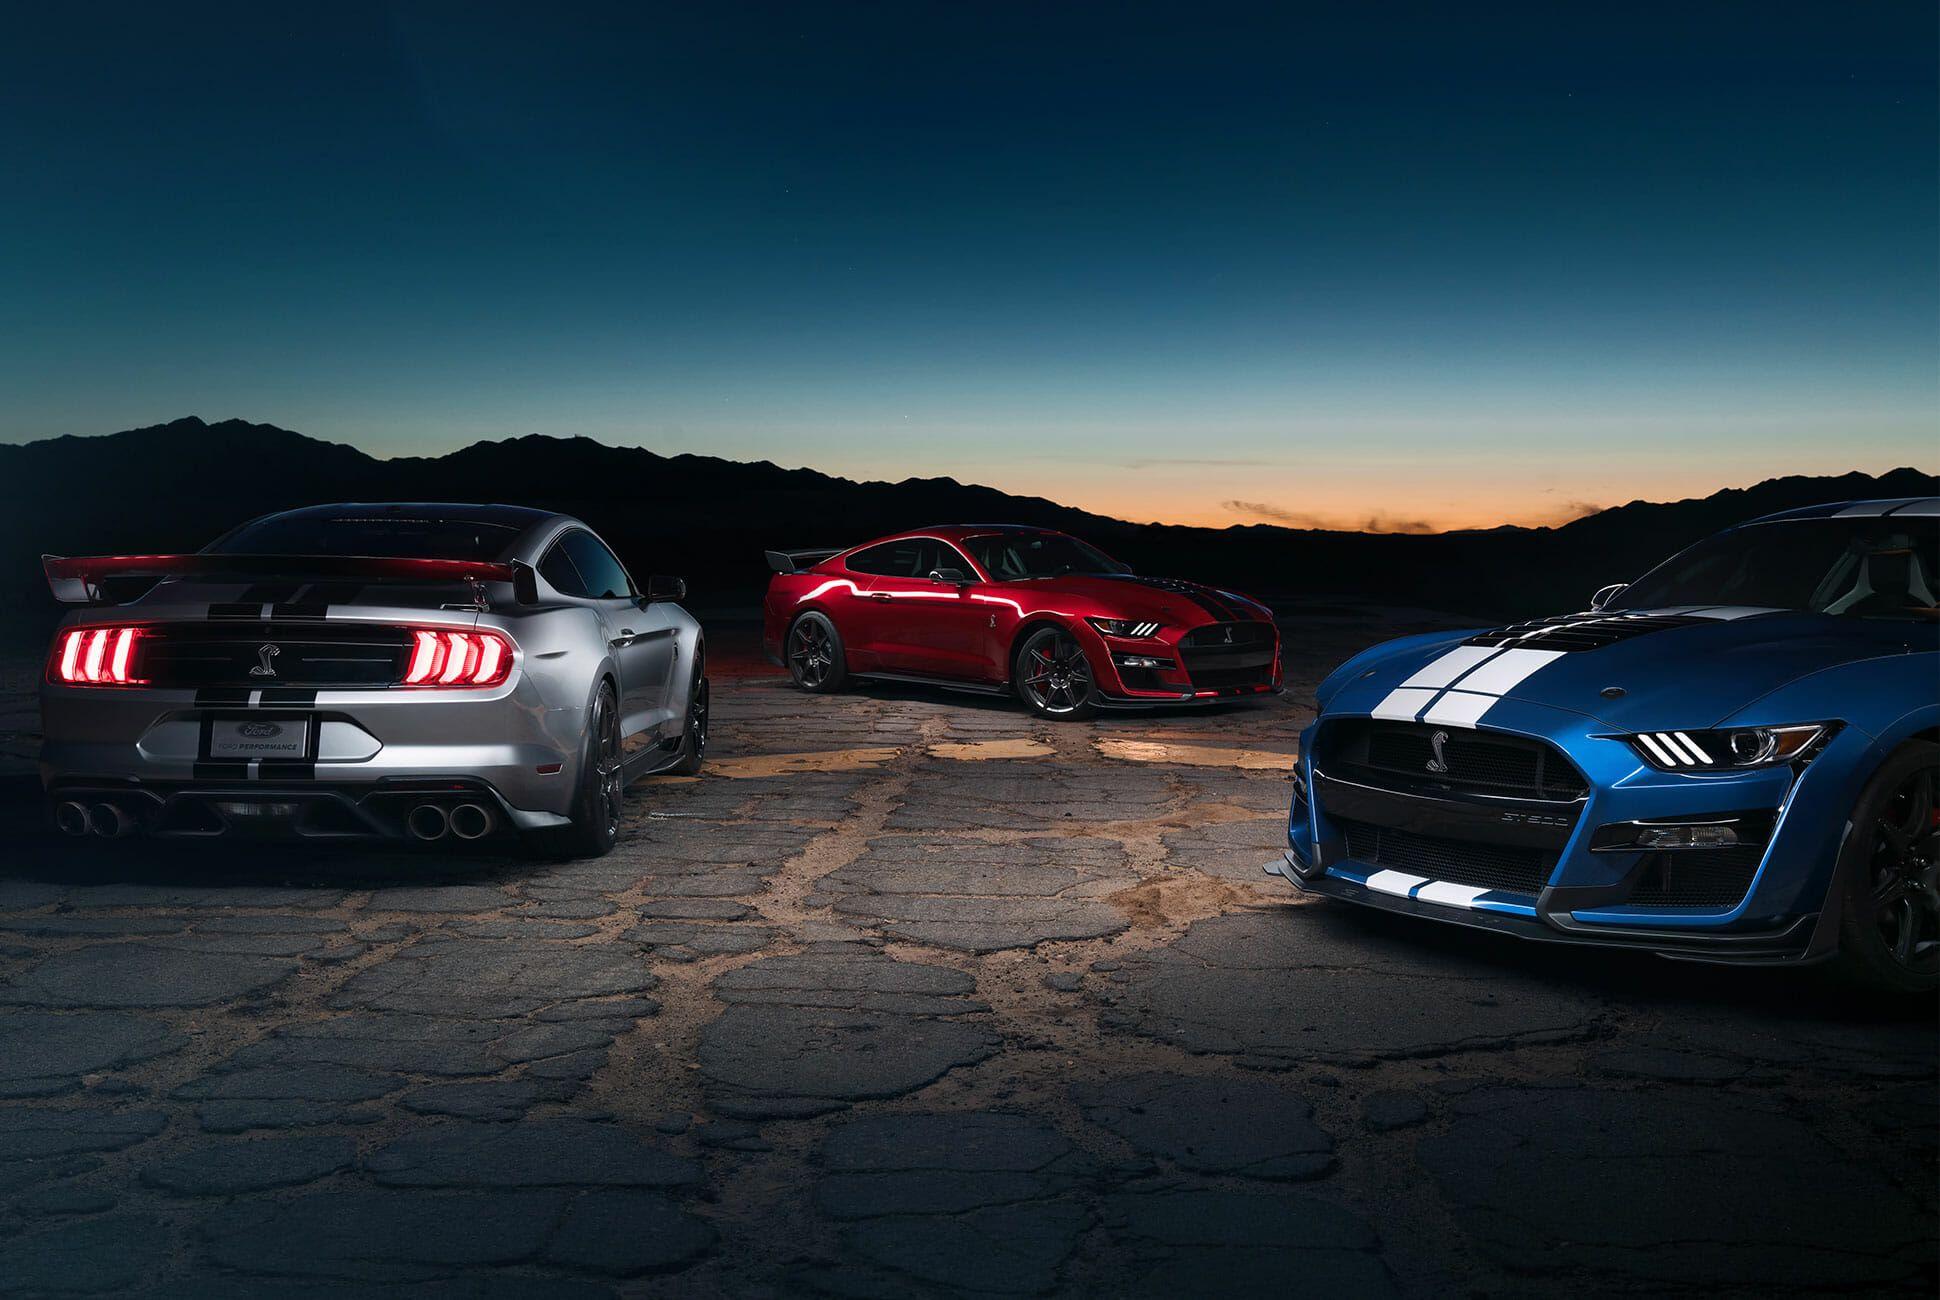 2020-Ford-Mustang-Shelby-GT500-gear-patrol-slide-3